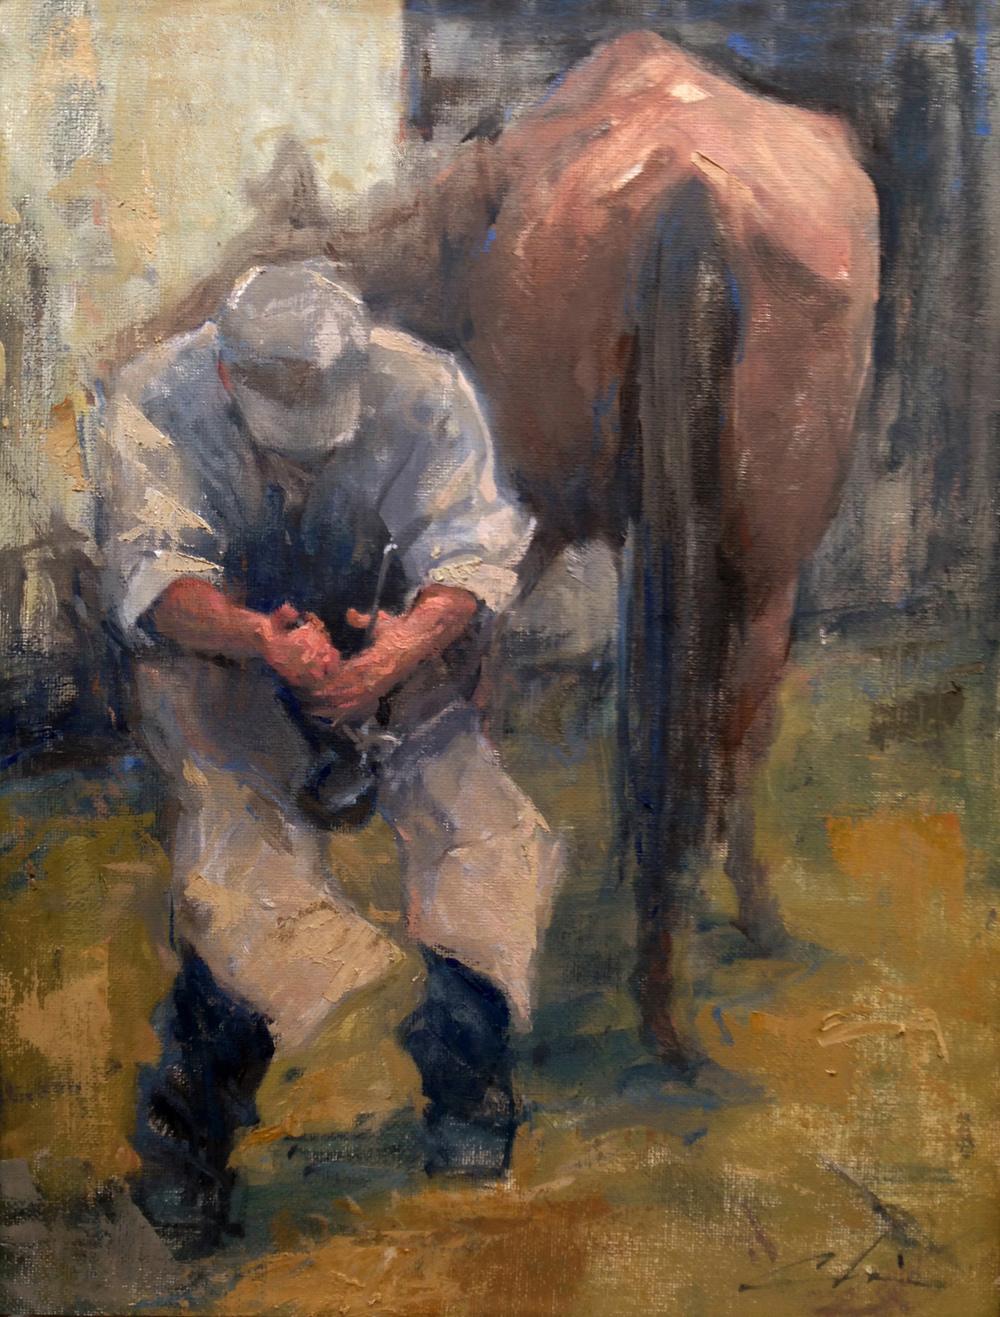 The Farrier, Oils 11 x 14